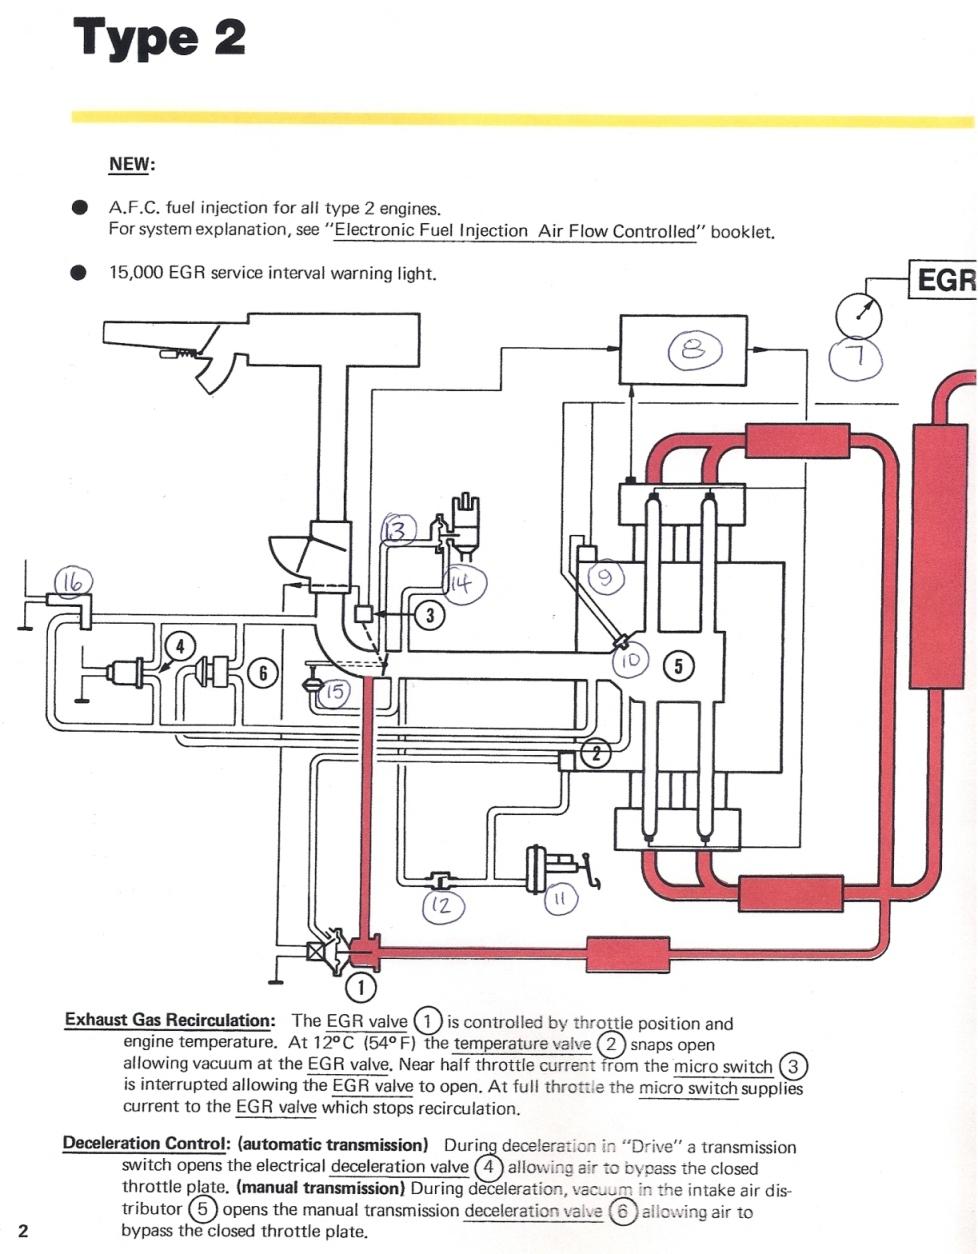 2002 vw passat exhaust system diagram marine wiring 12 volt volkswagen engine water hoses electricity site library